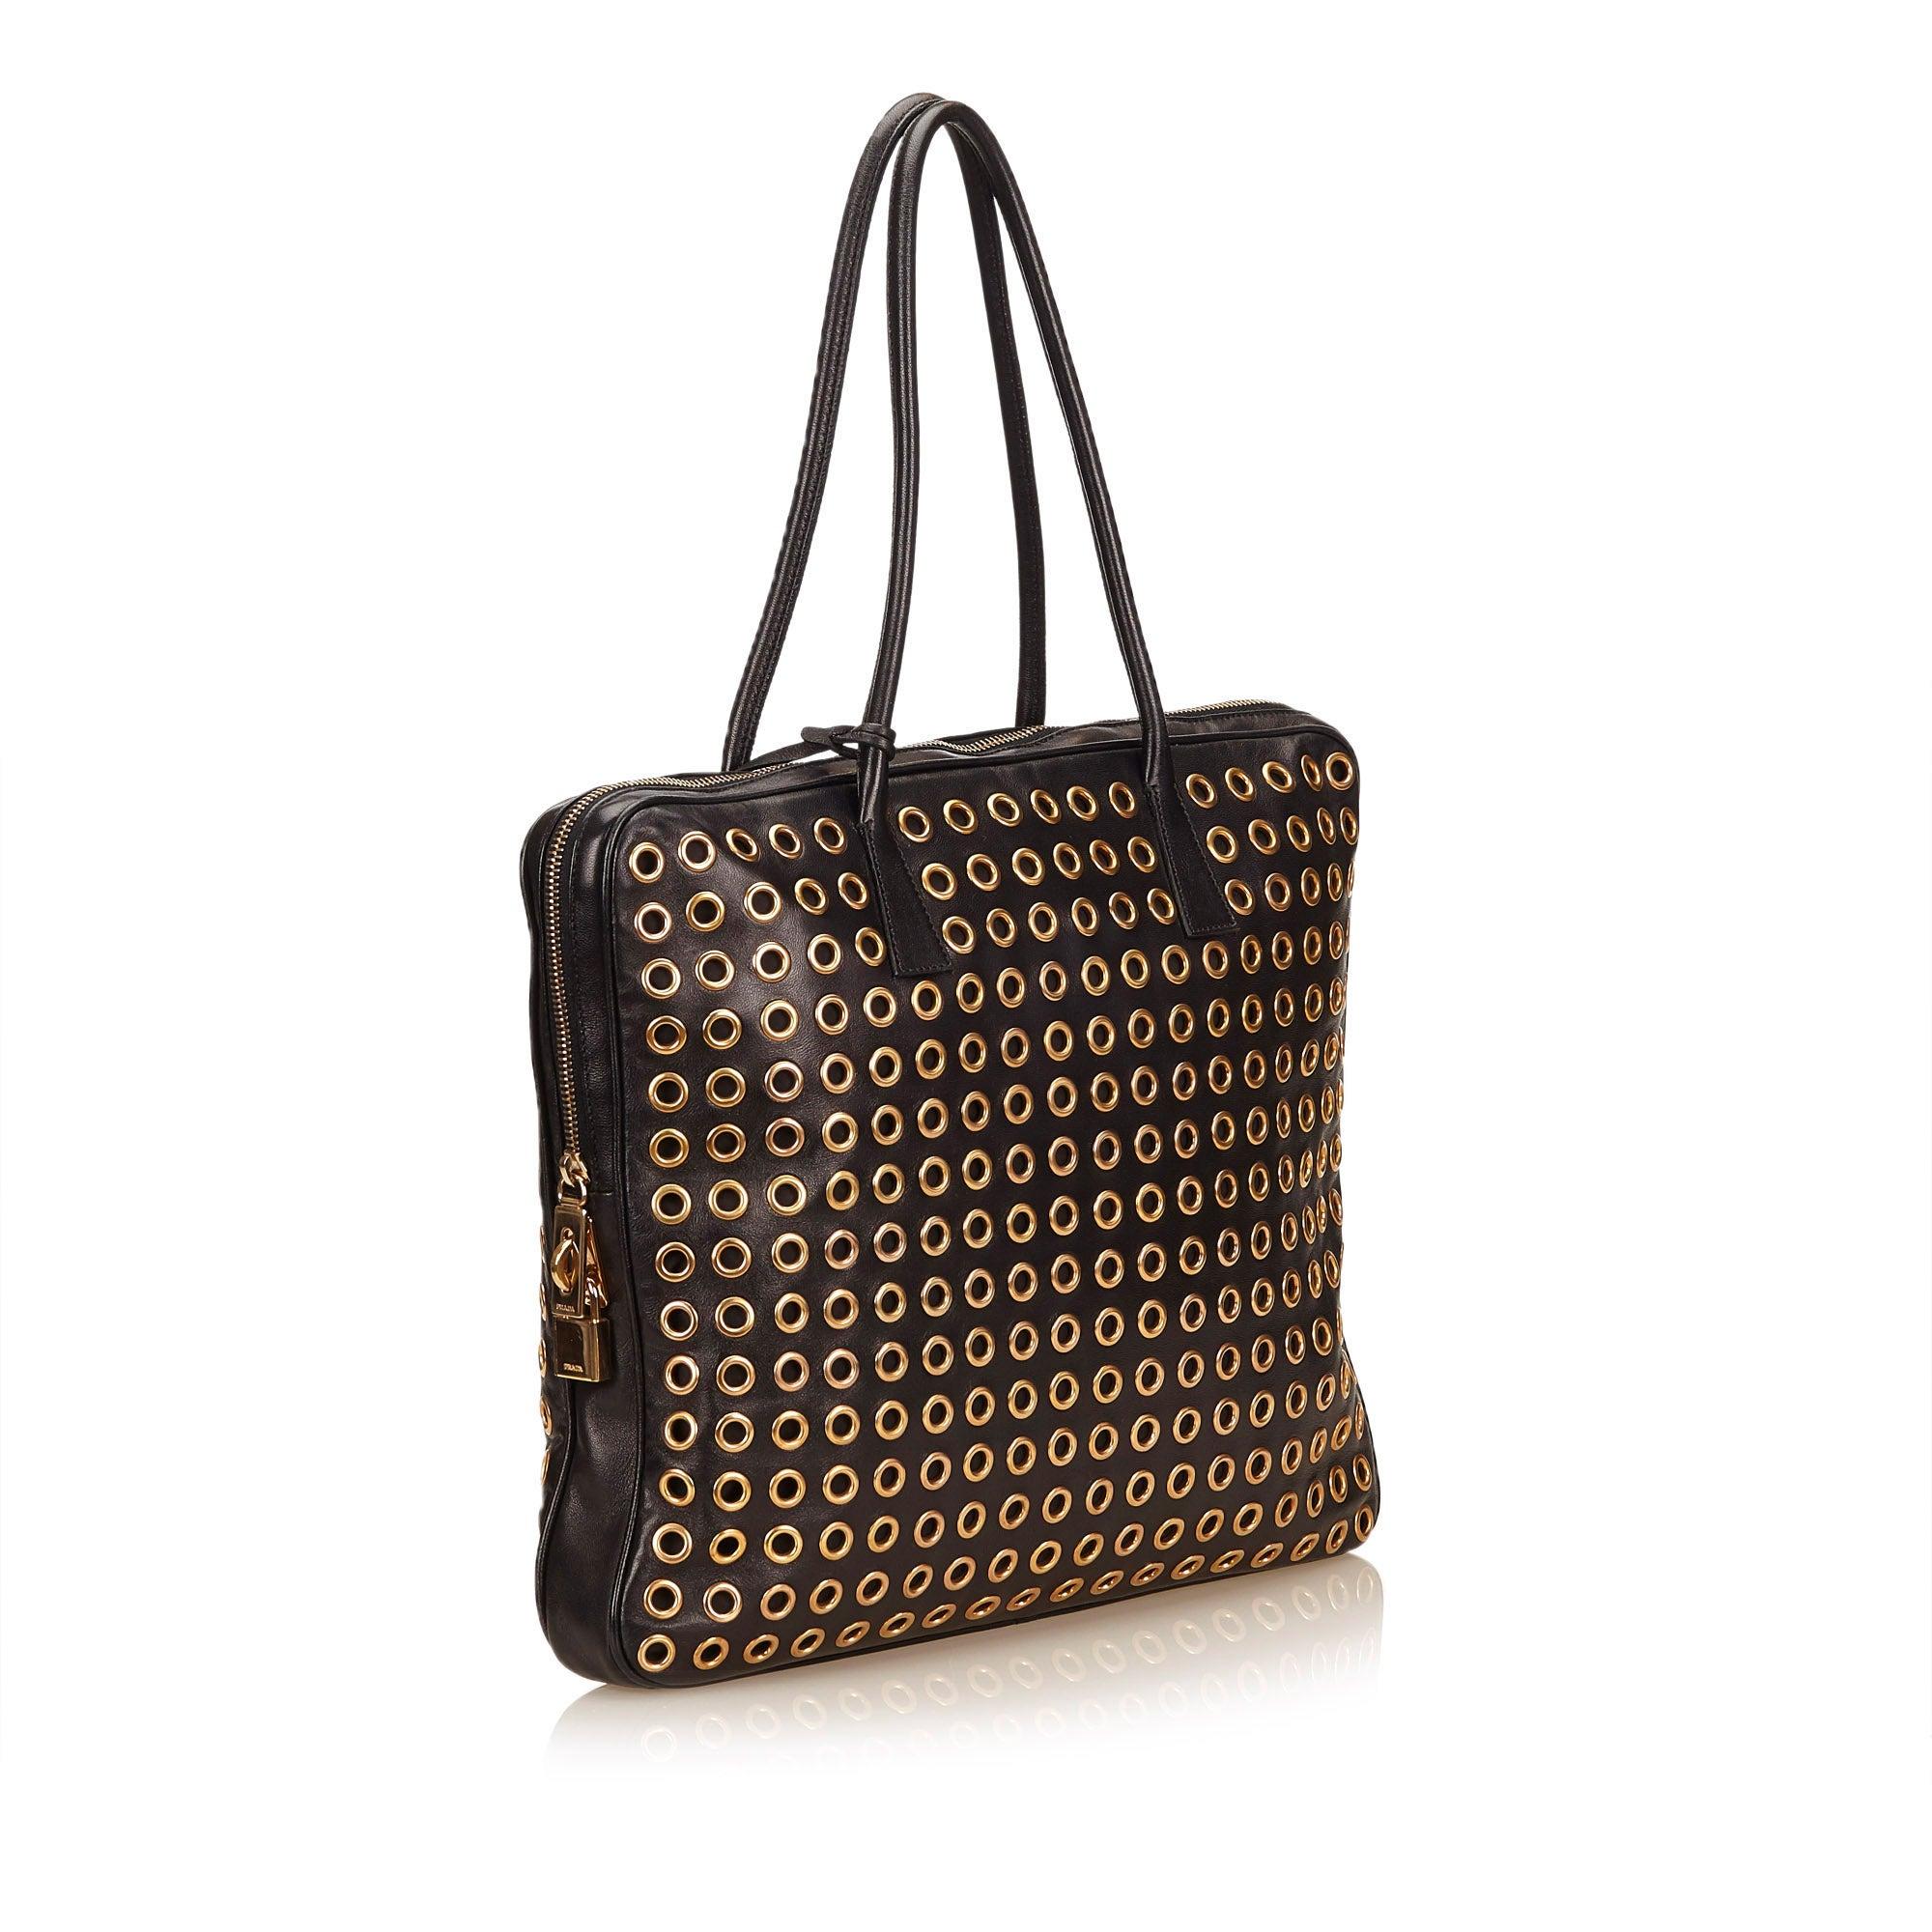 5a49f26625 Versace Jeans Black Eyelet Tote Bag